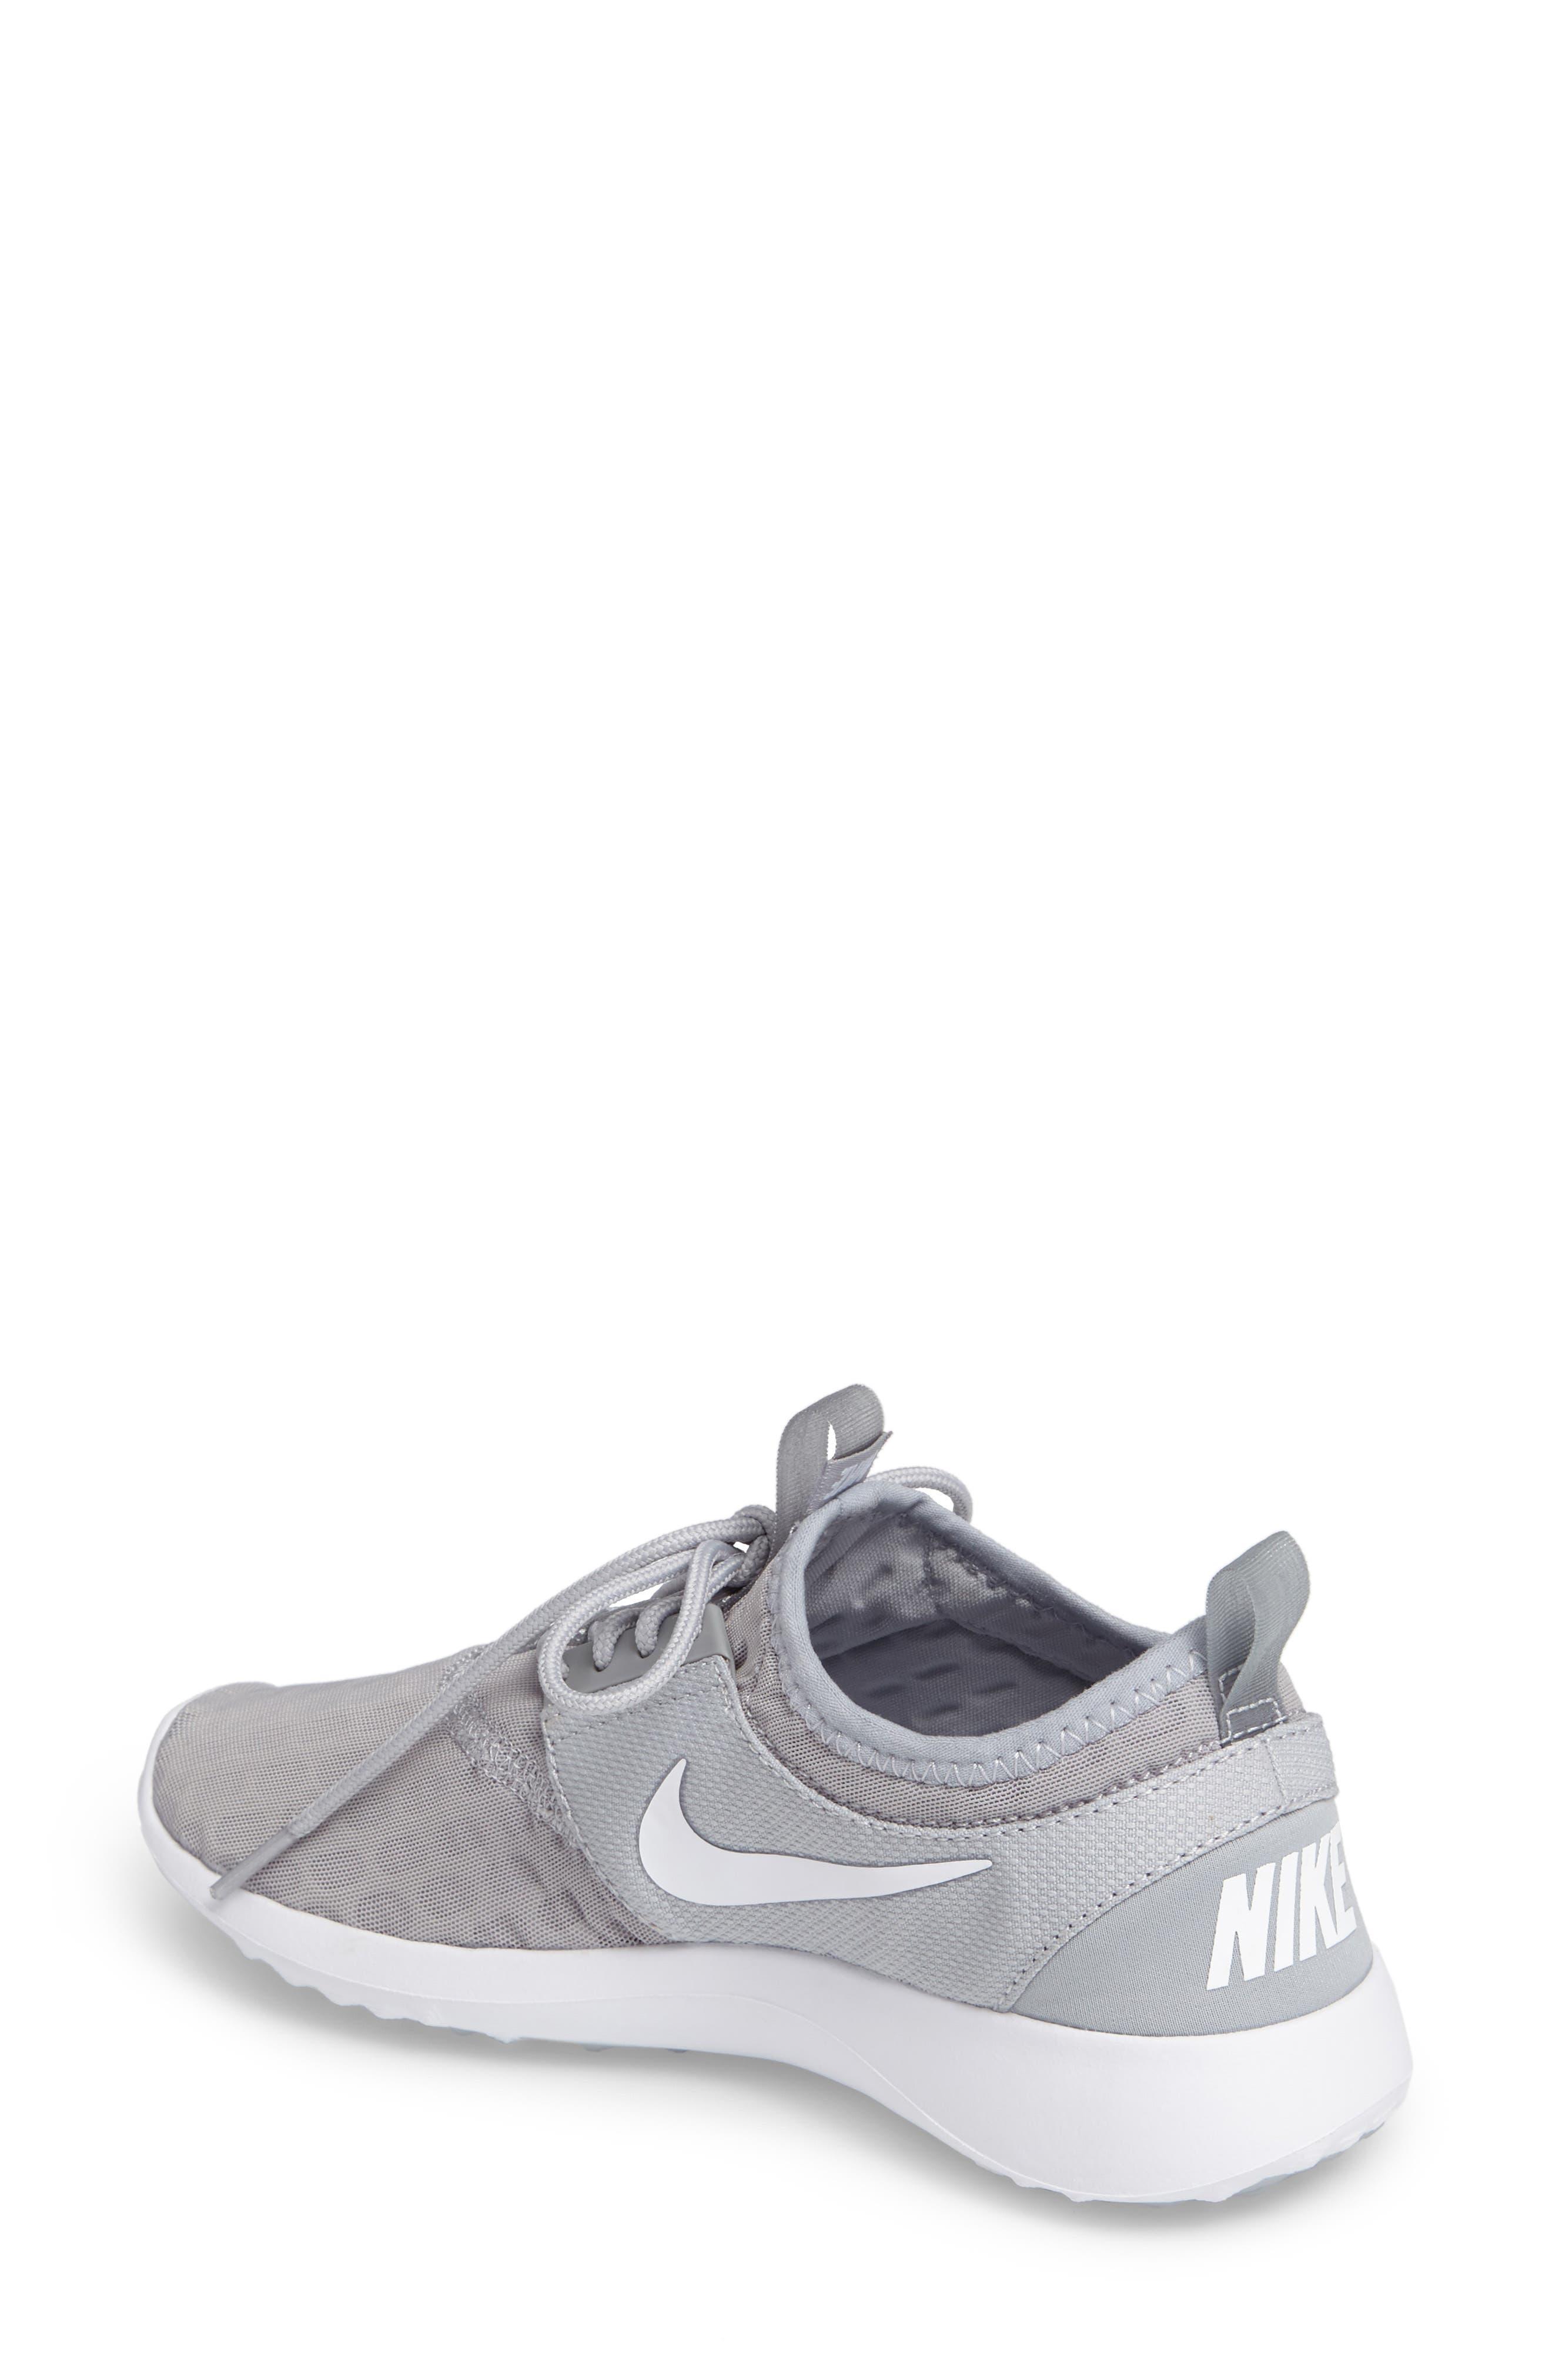 Juvenate Sneaker,                             Alternate thumbnail 75, color,